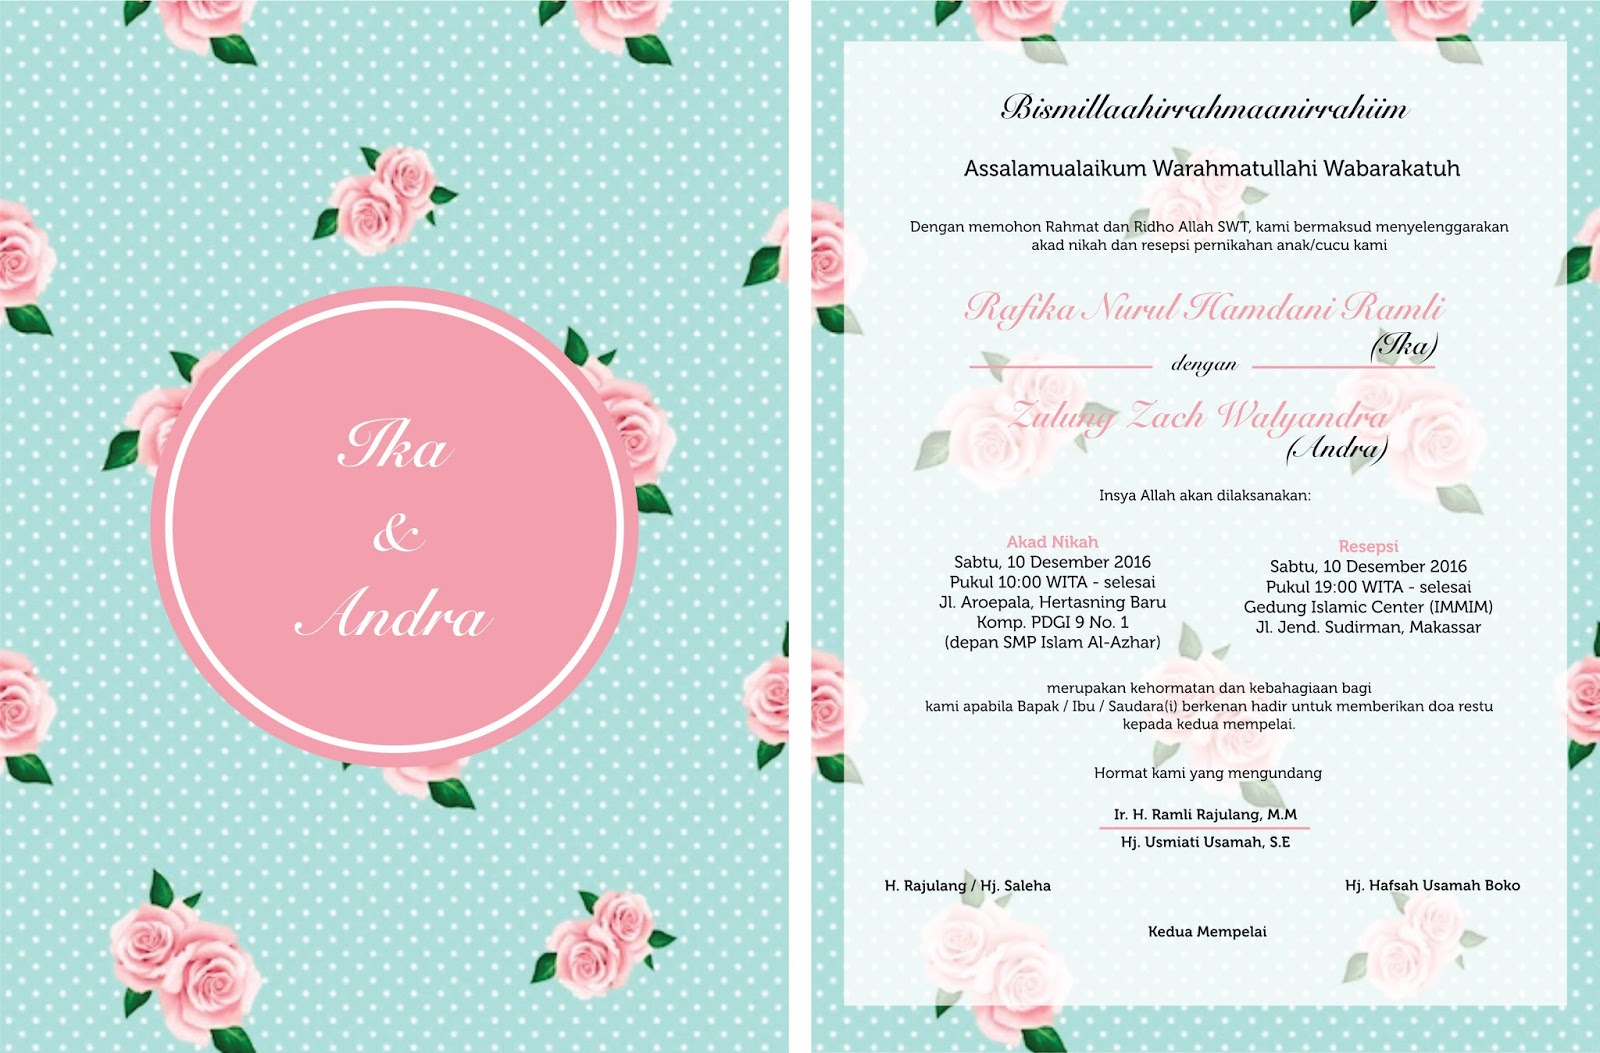 Kamar kiki indonesian wedding invitation philosophy first attempt stopboris Gallery